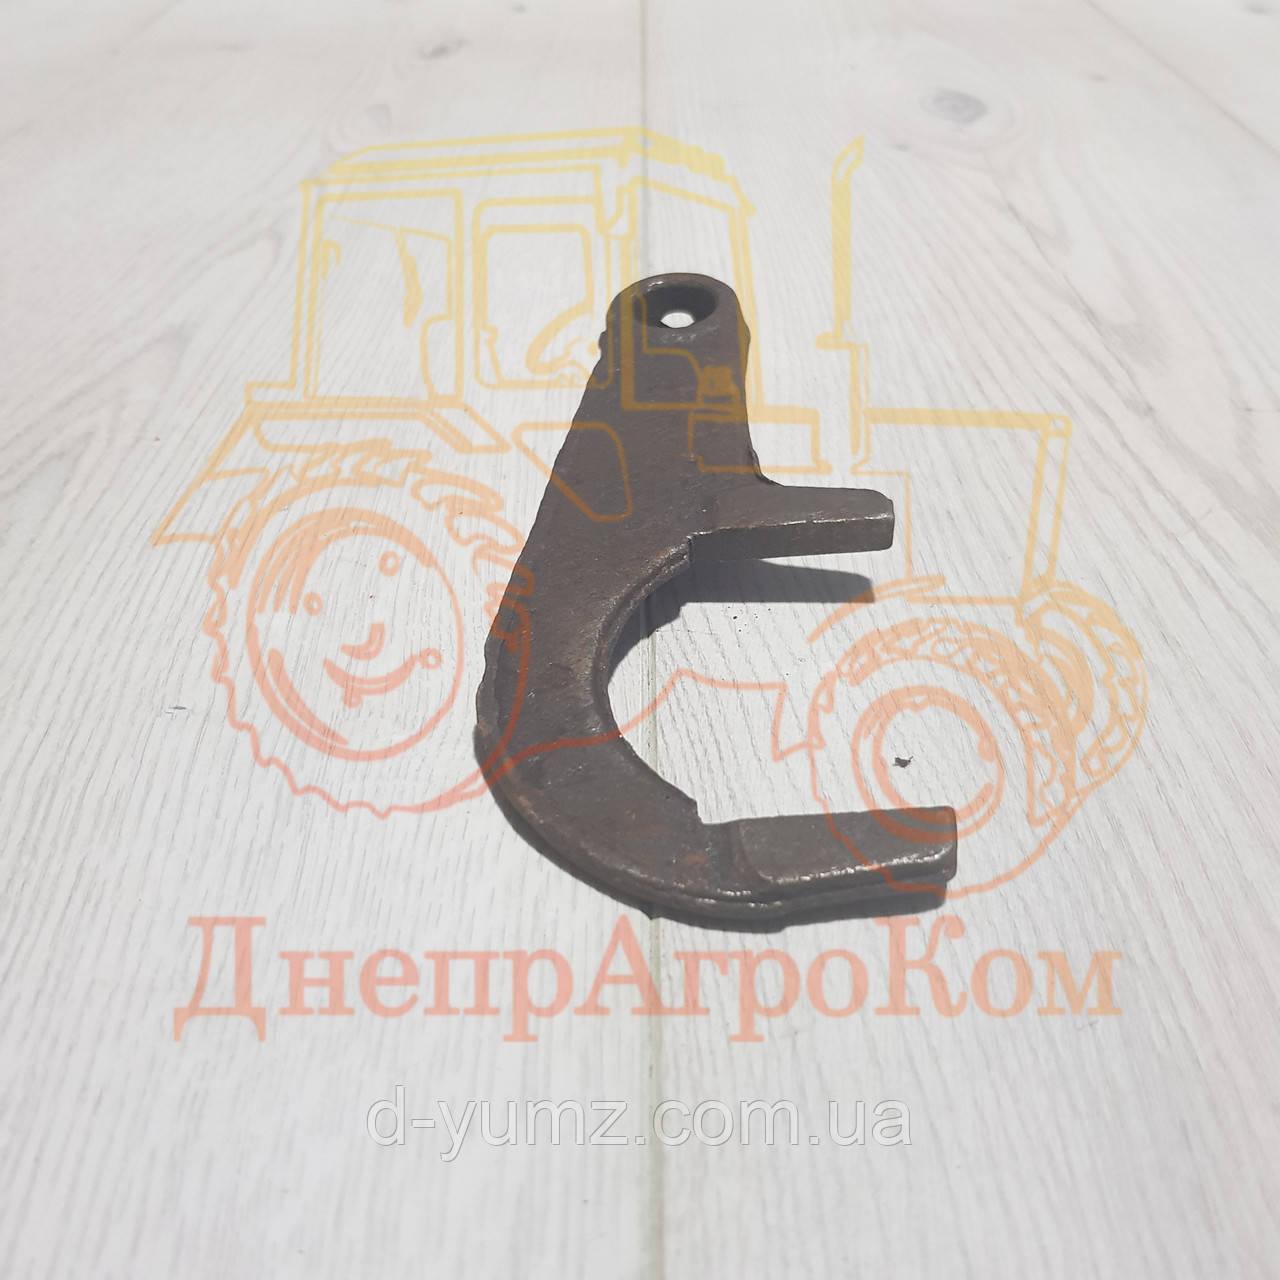 Вилка ЮМЗ переключения редуктора | пр-во Украина | 40-1702028